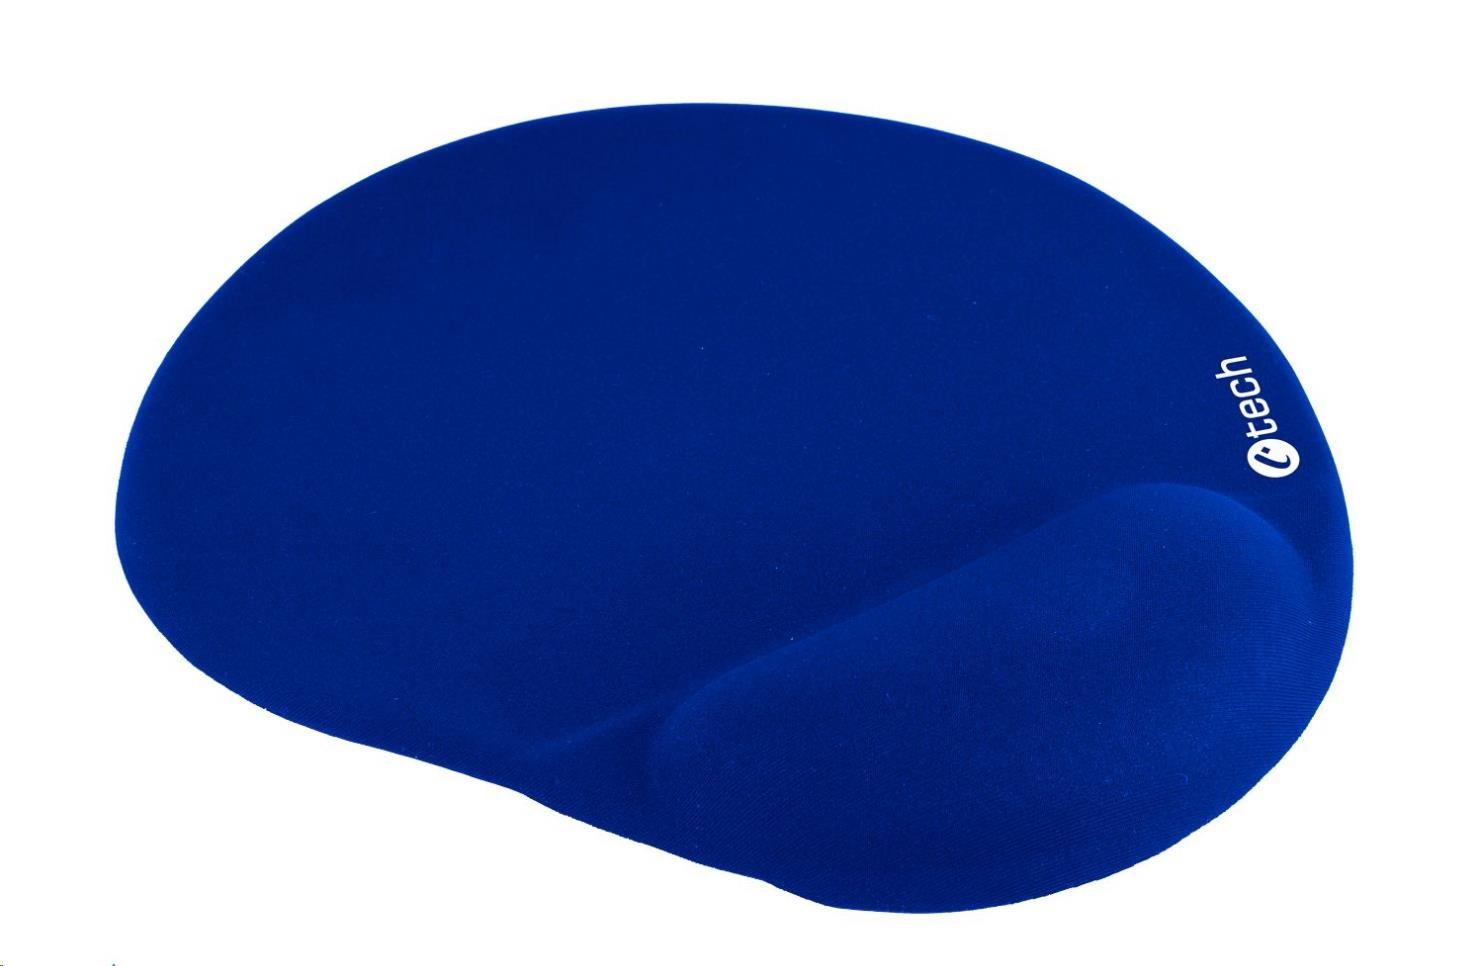 C-TECH Podložka pod myš gelová MPG-03, modrá, 240x220mm, MPG-03B